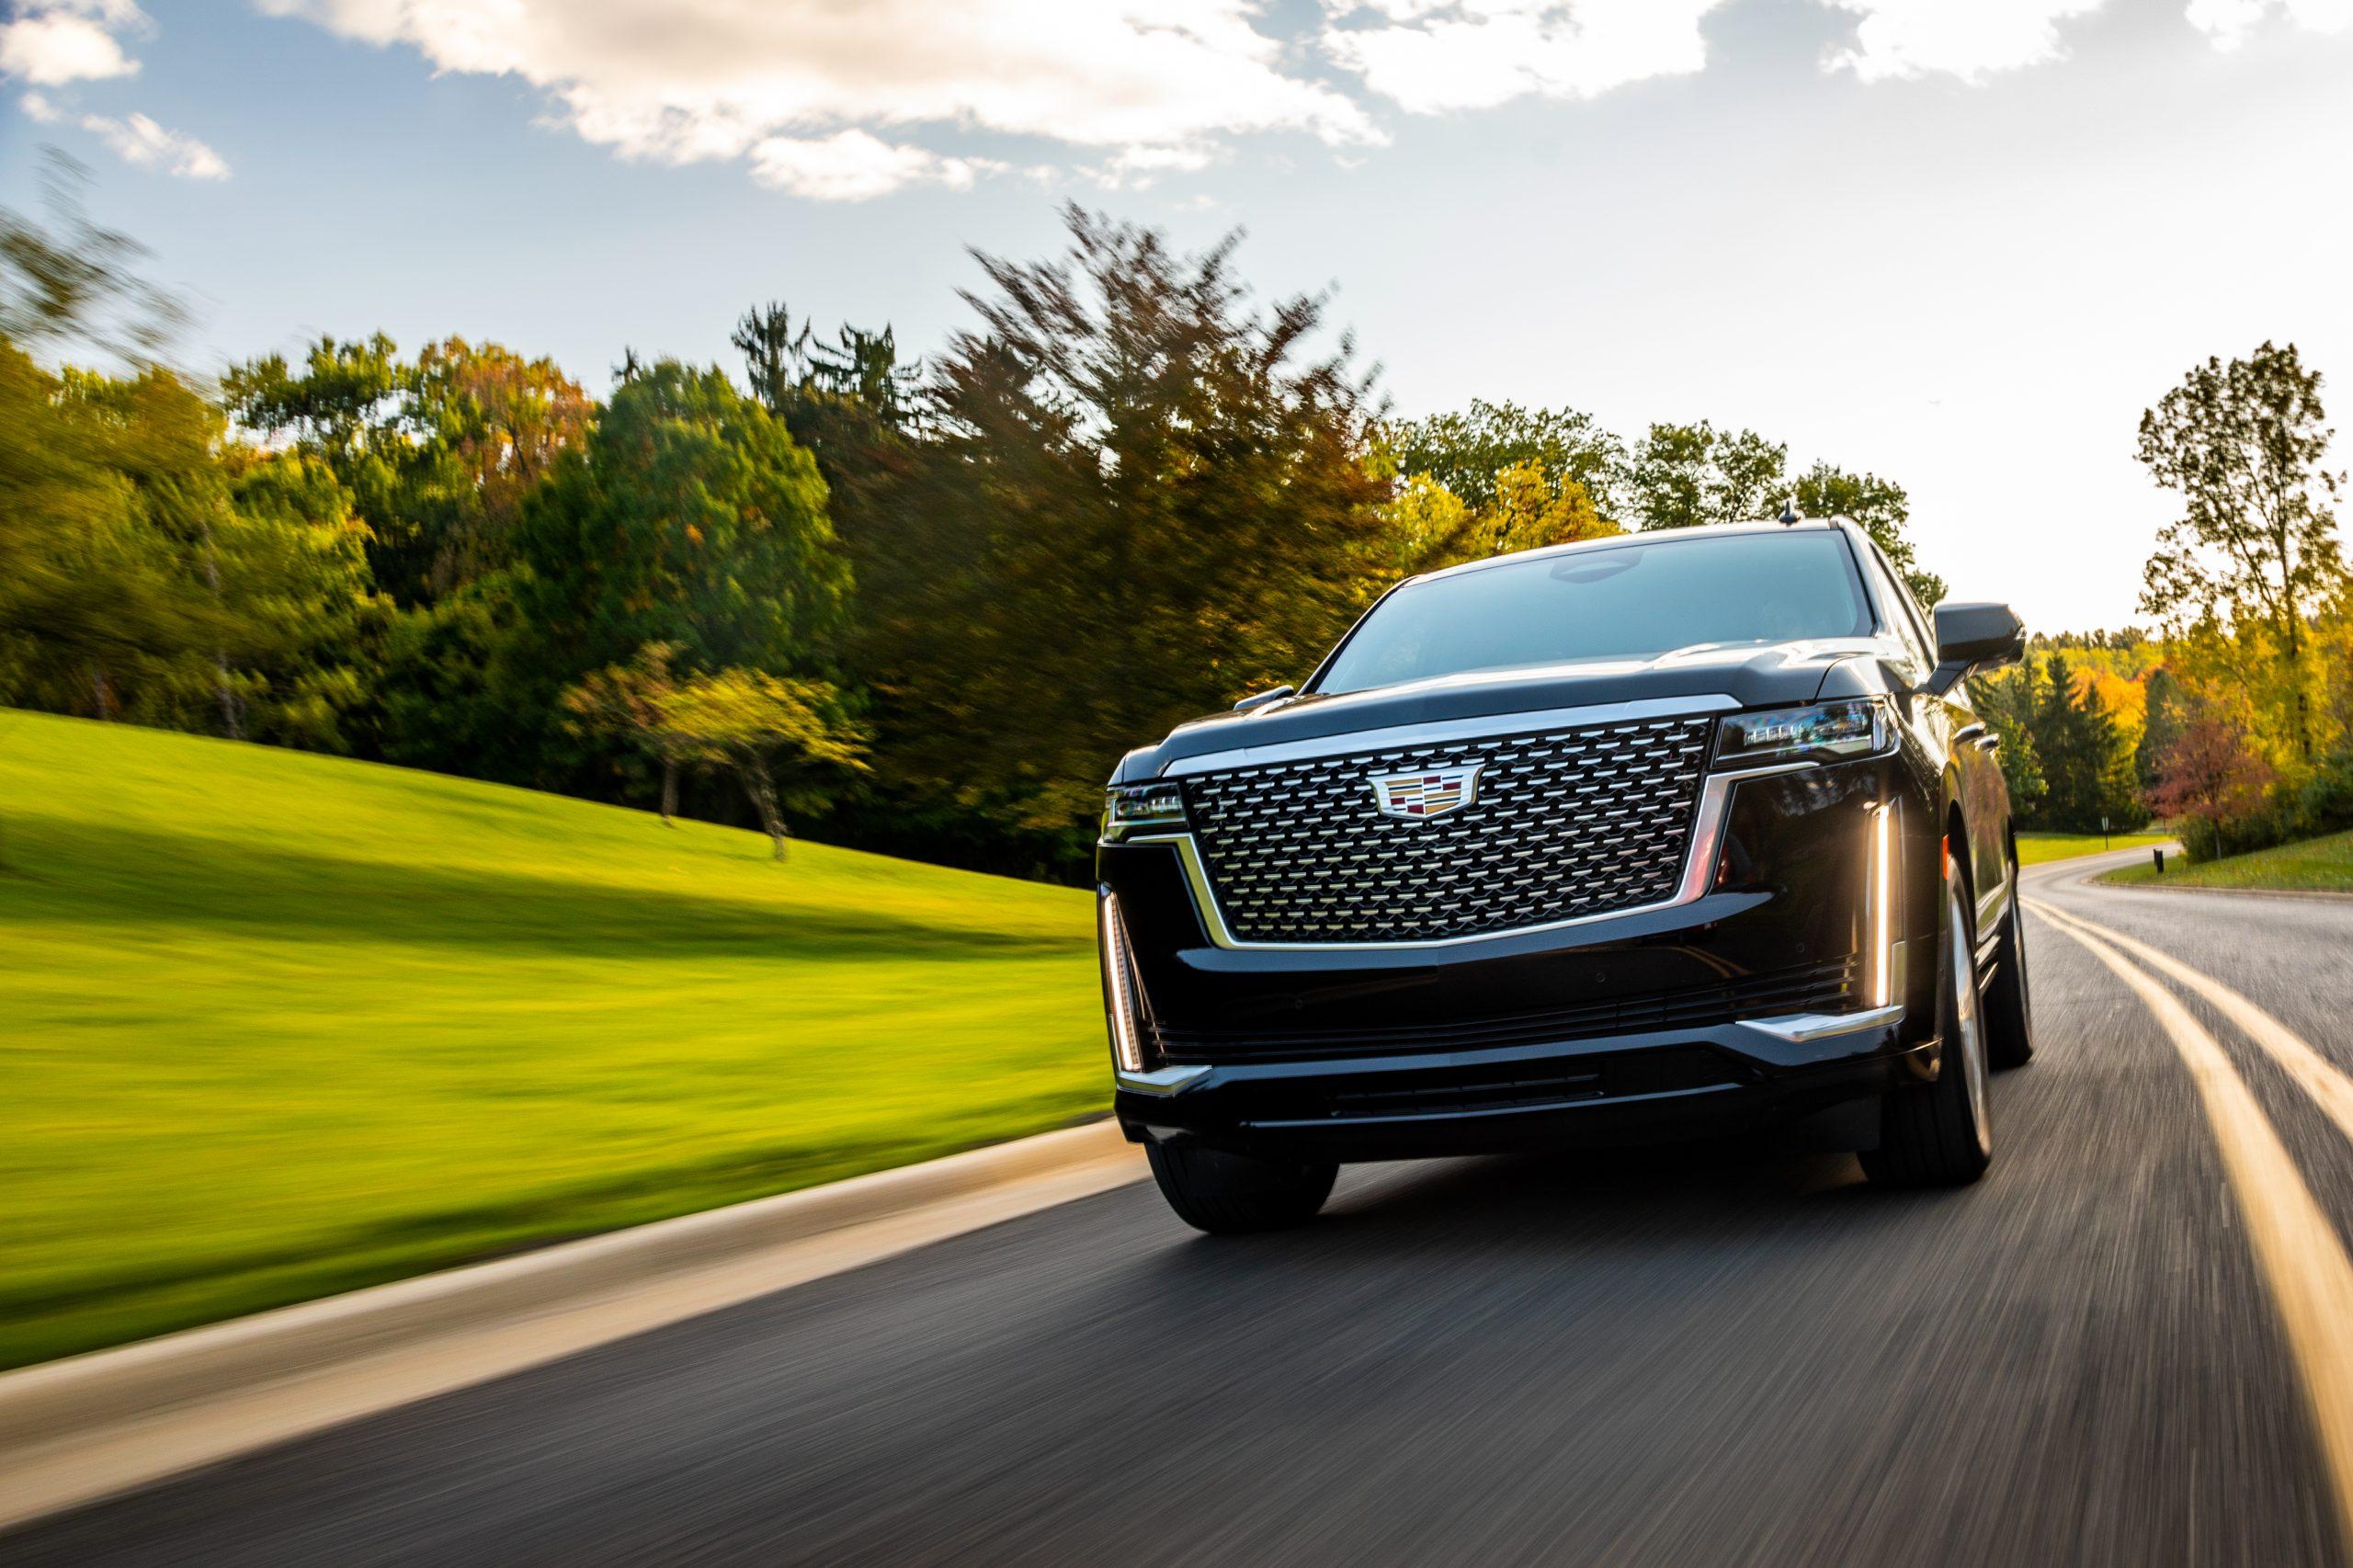 Review: 2021 Cadillac Escalade 2WD Premium